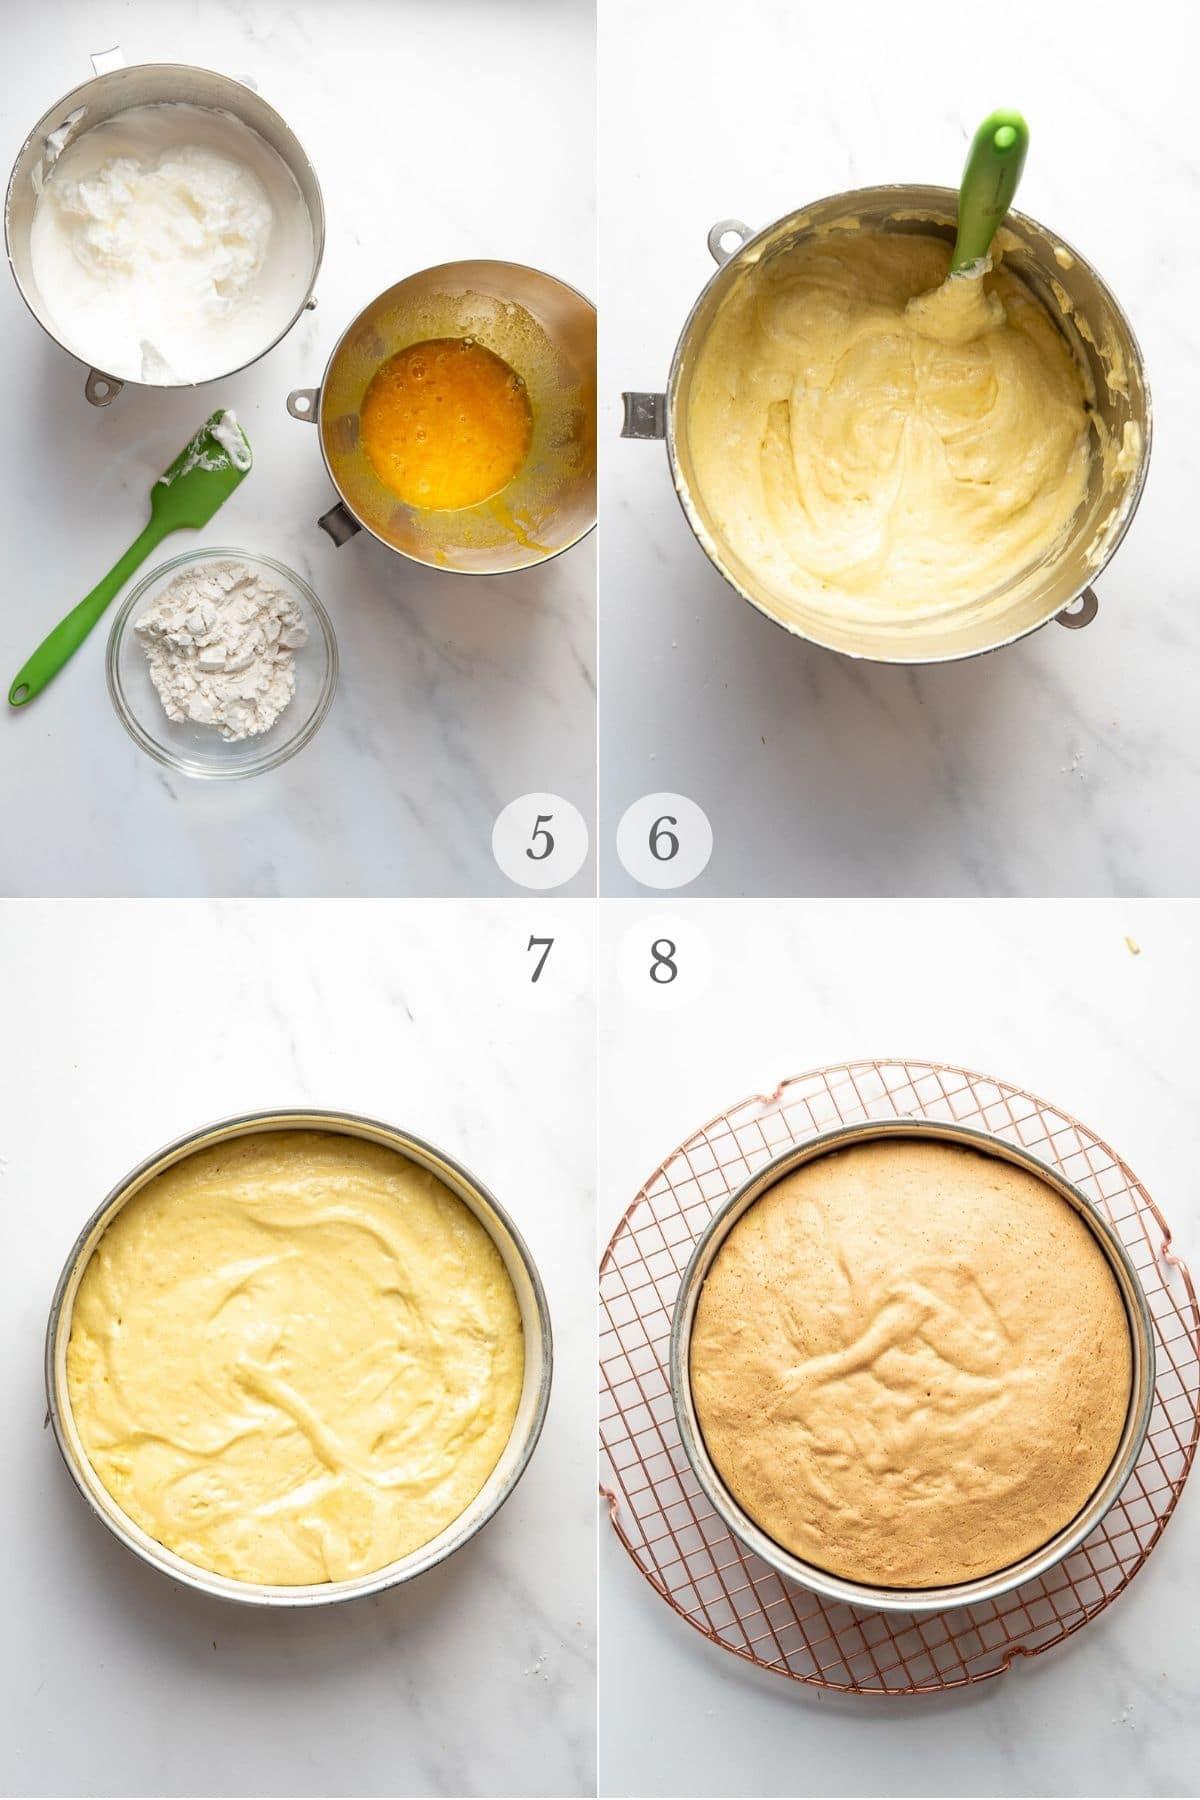 tres leches cake recipe steps 4-8